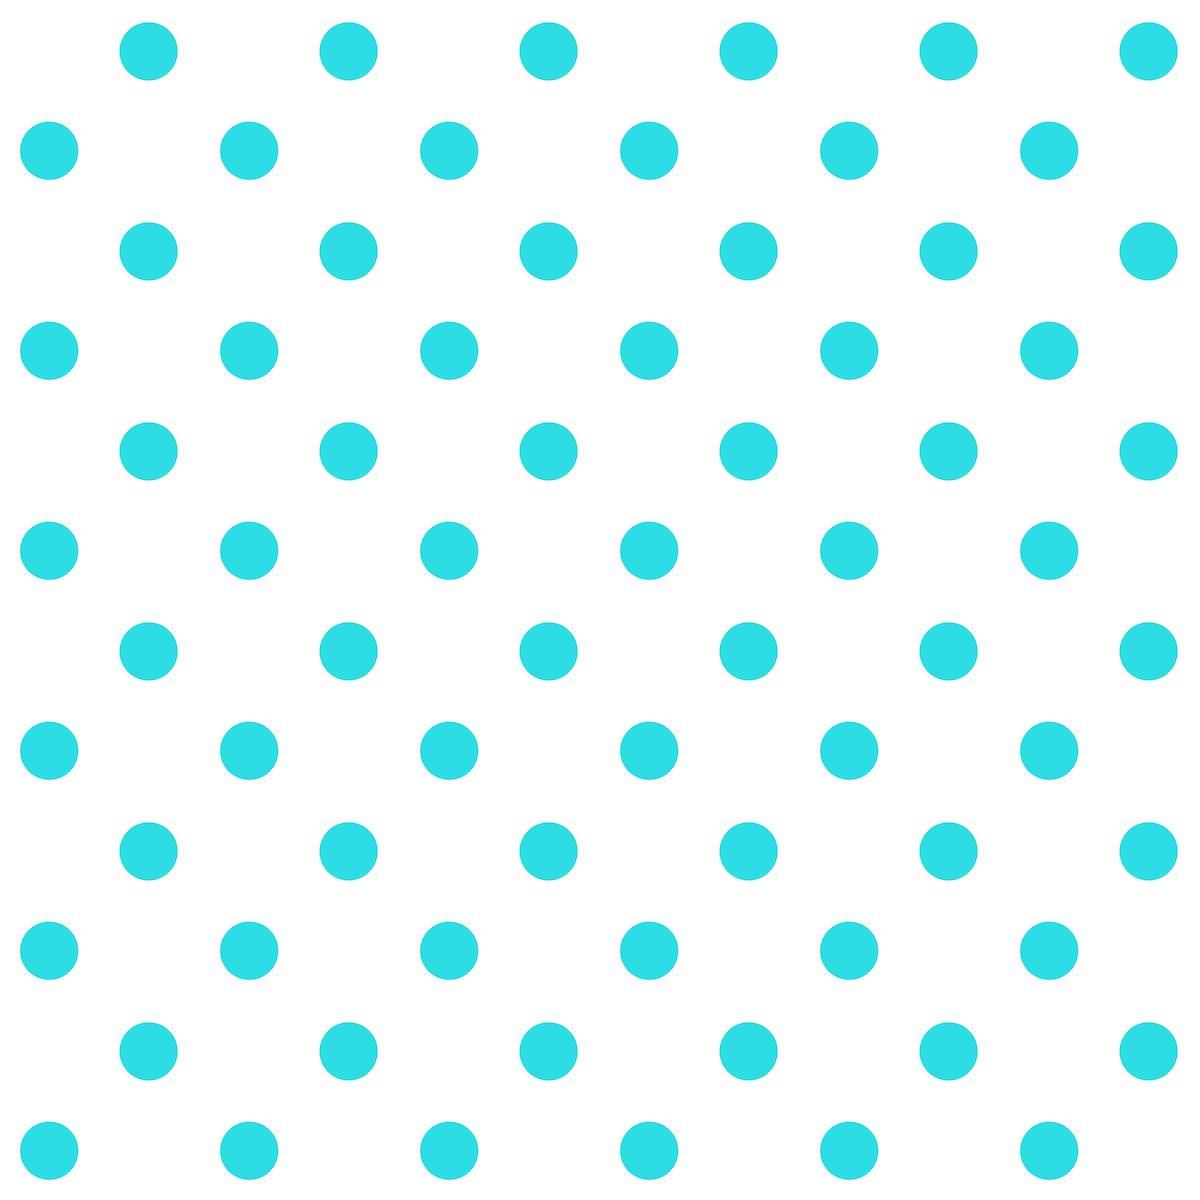 Free digital polka dot scrapbooking papers - ausdruckbare Geschenkpapiere -  freebie   MeinLilaPark  digital freebies